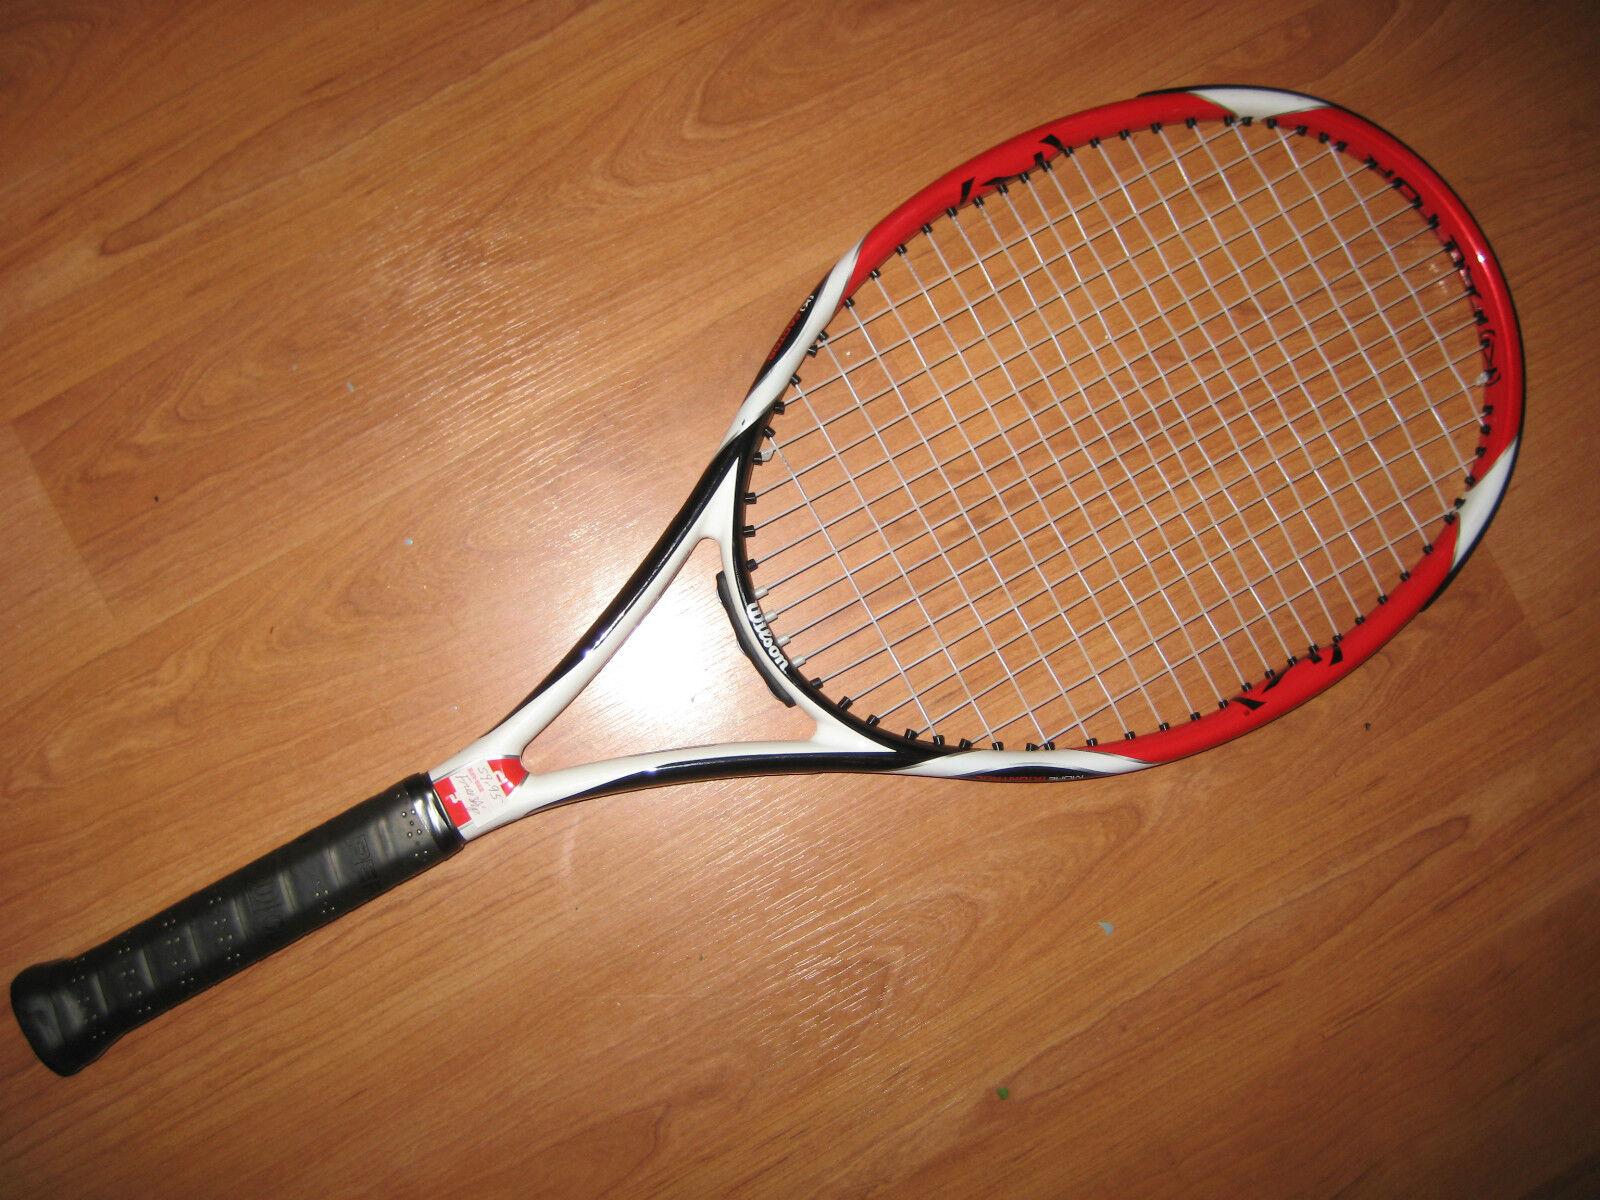 Wilson Hyper Hammer 5.6 Tenis Raqueta - 4 1 2